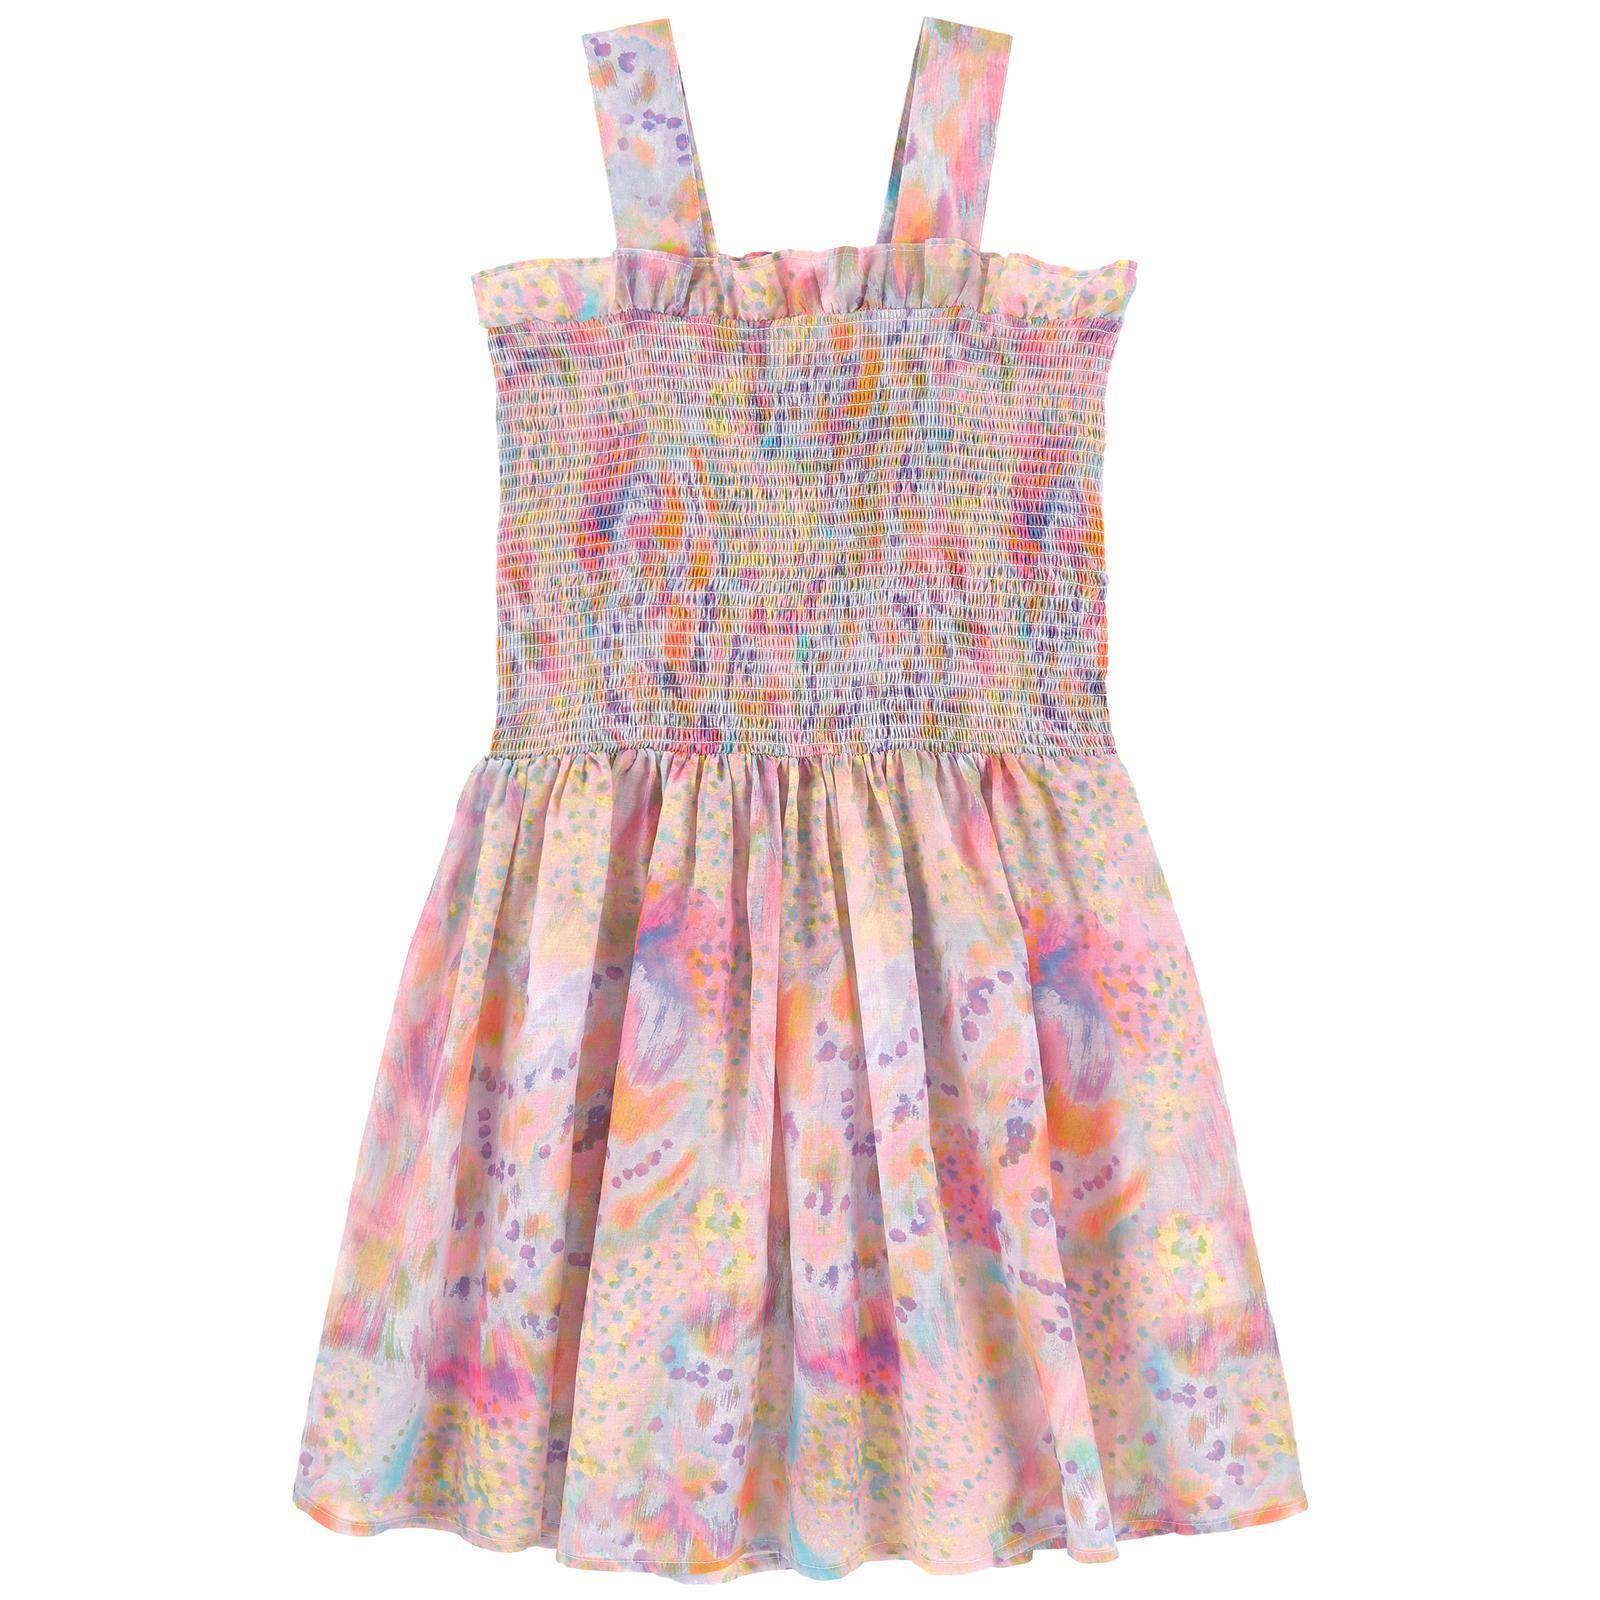 Stella McCartney 'Paloma' Kids Smocked Dress